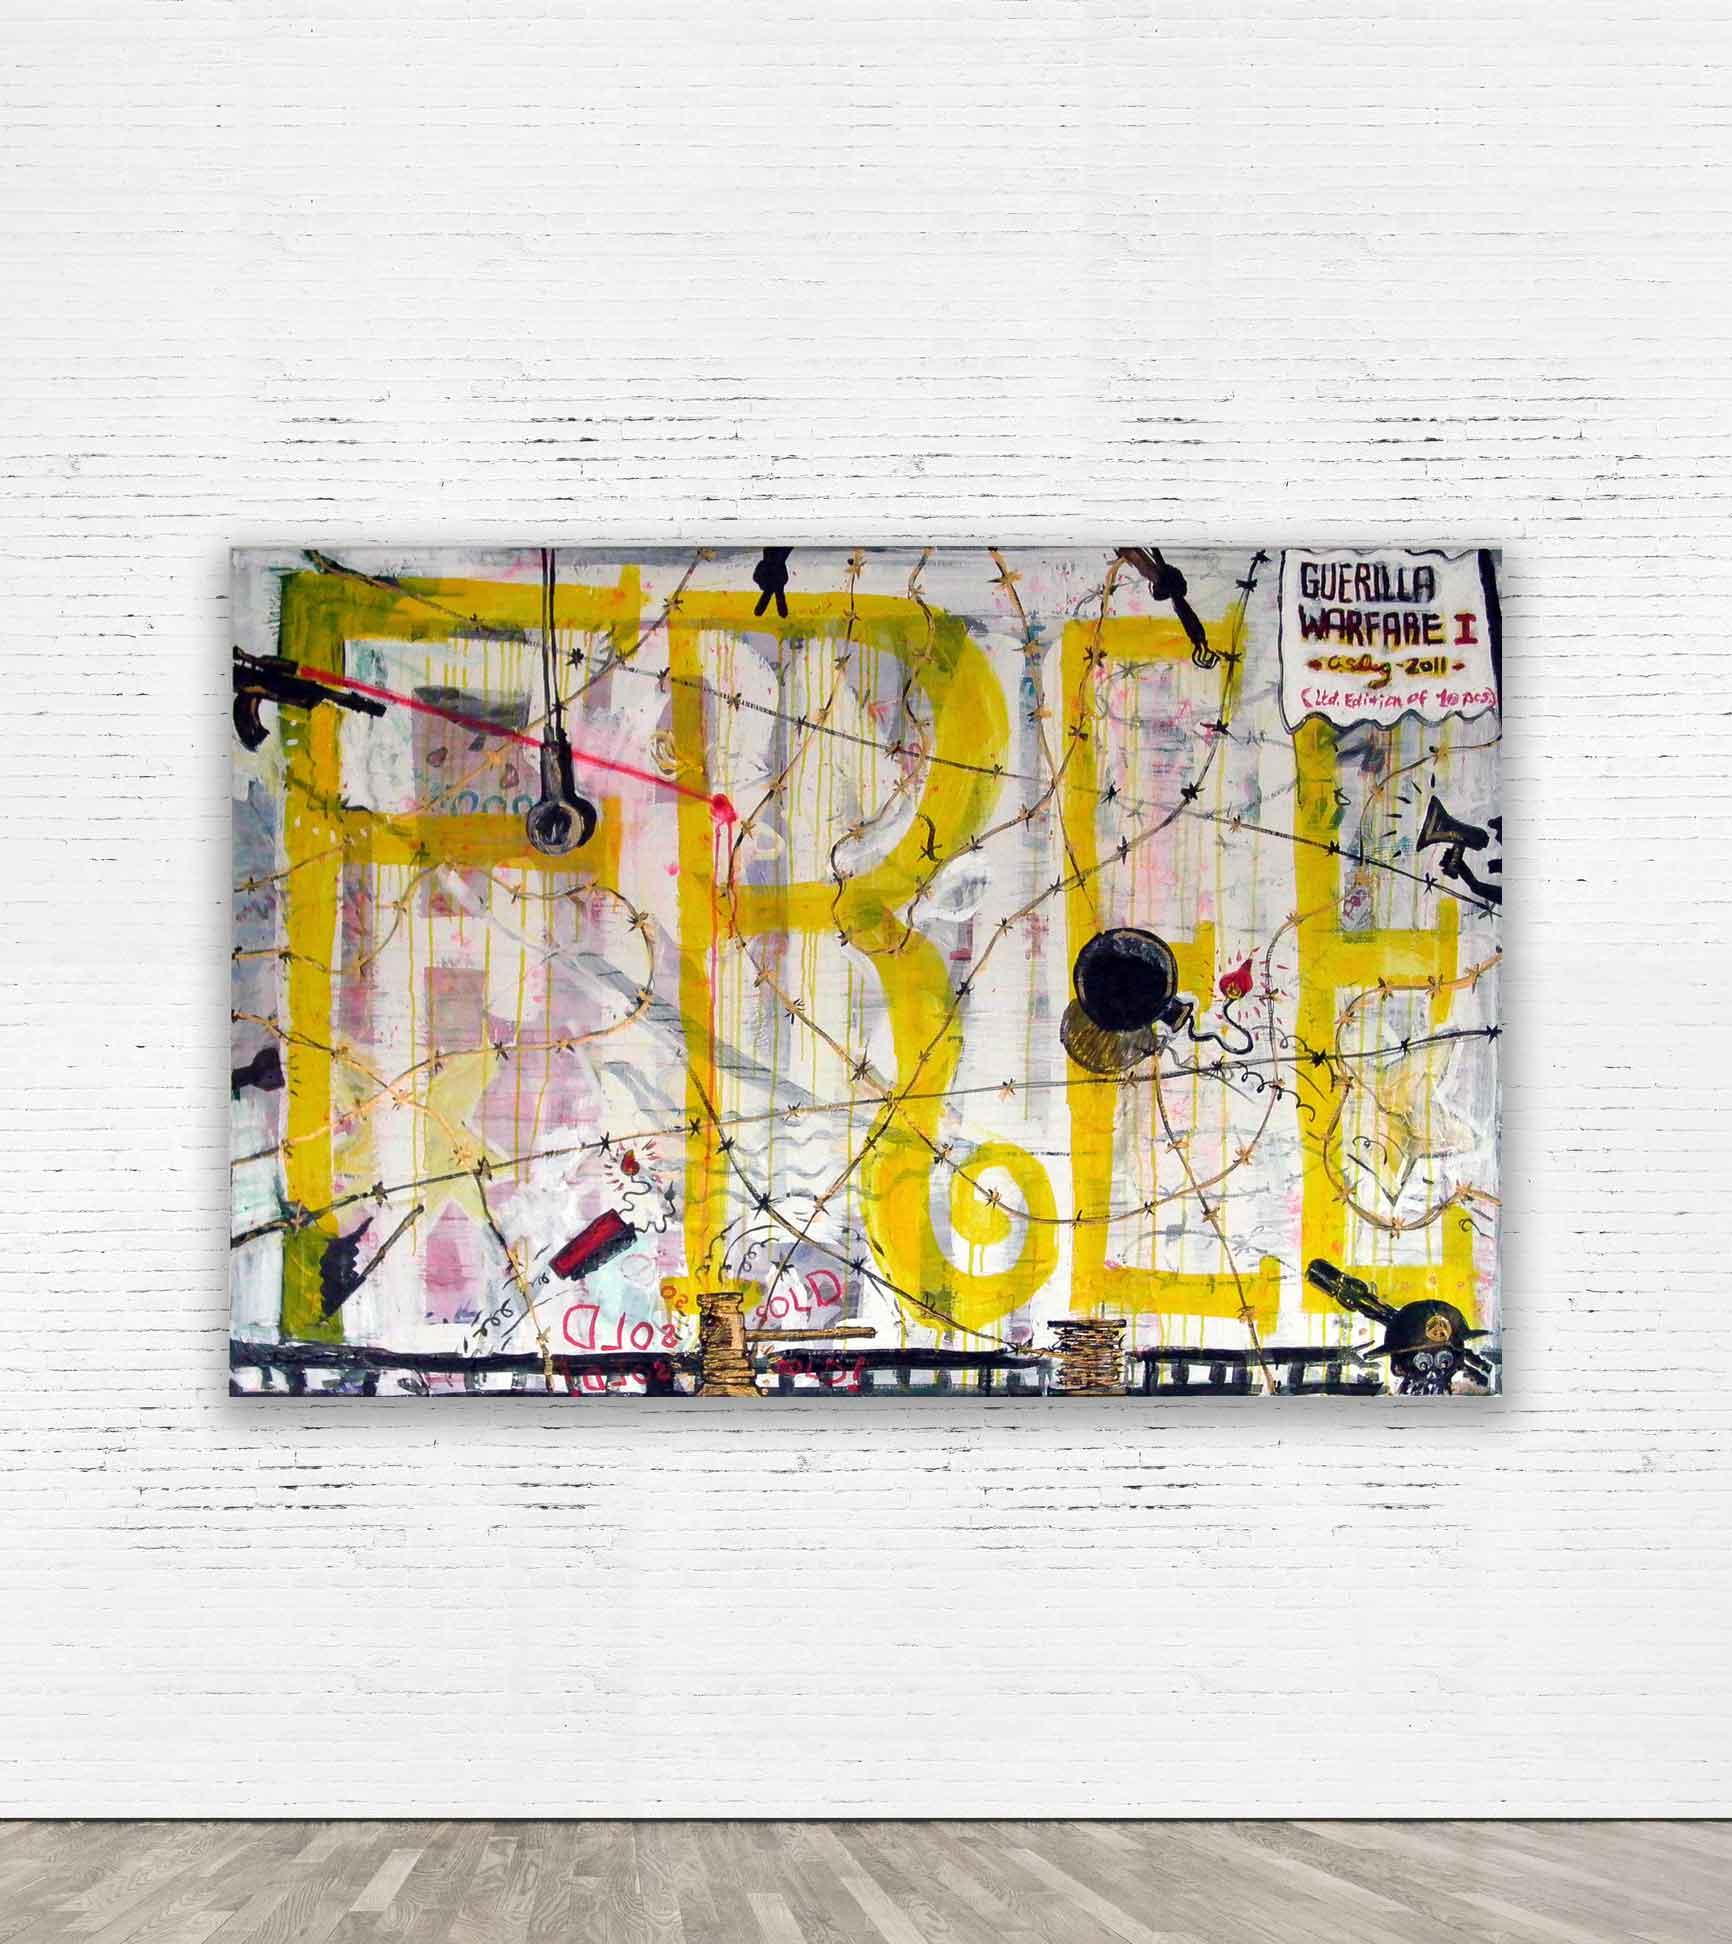 """GUERILLA WARFARE""  2011 Acrylic on canvas 150 x 100 cm   SOLD"